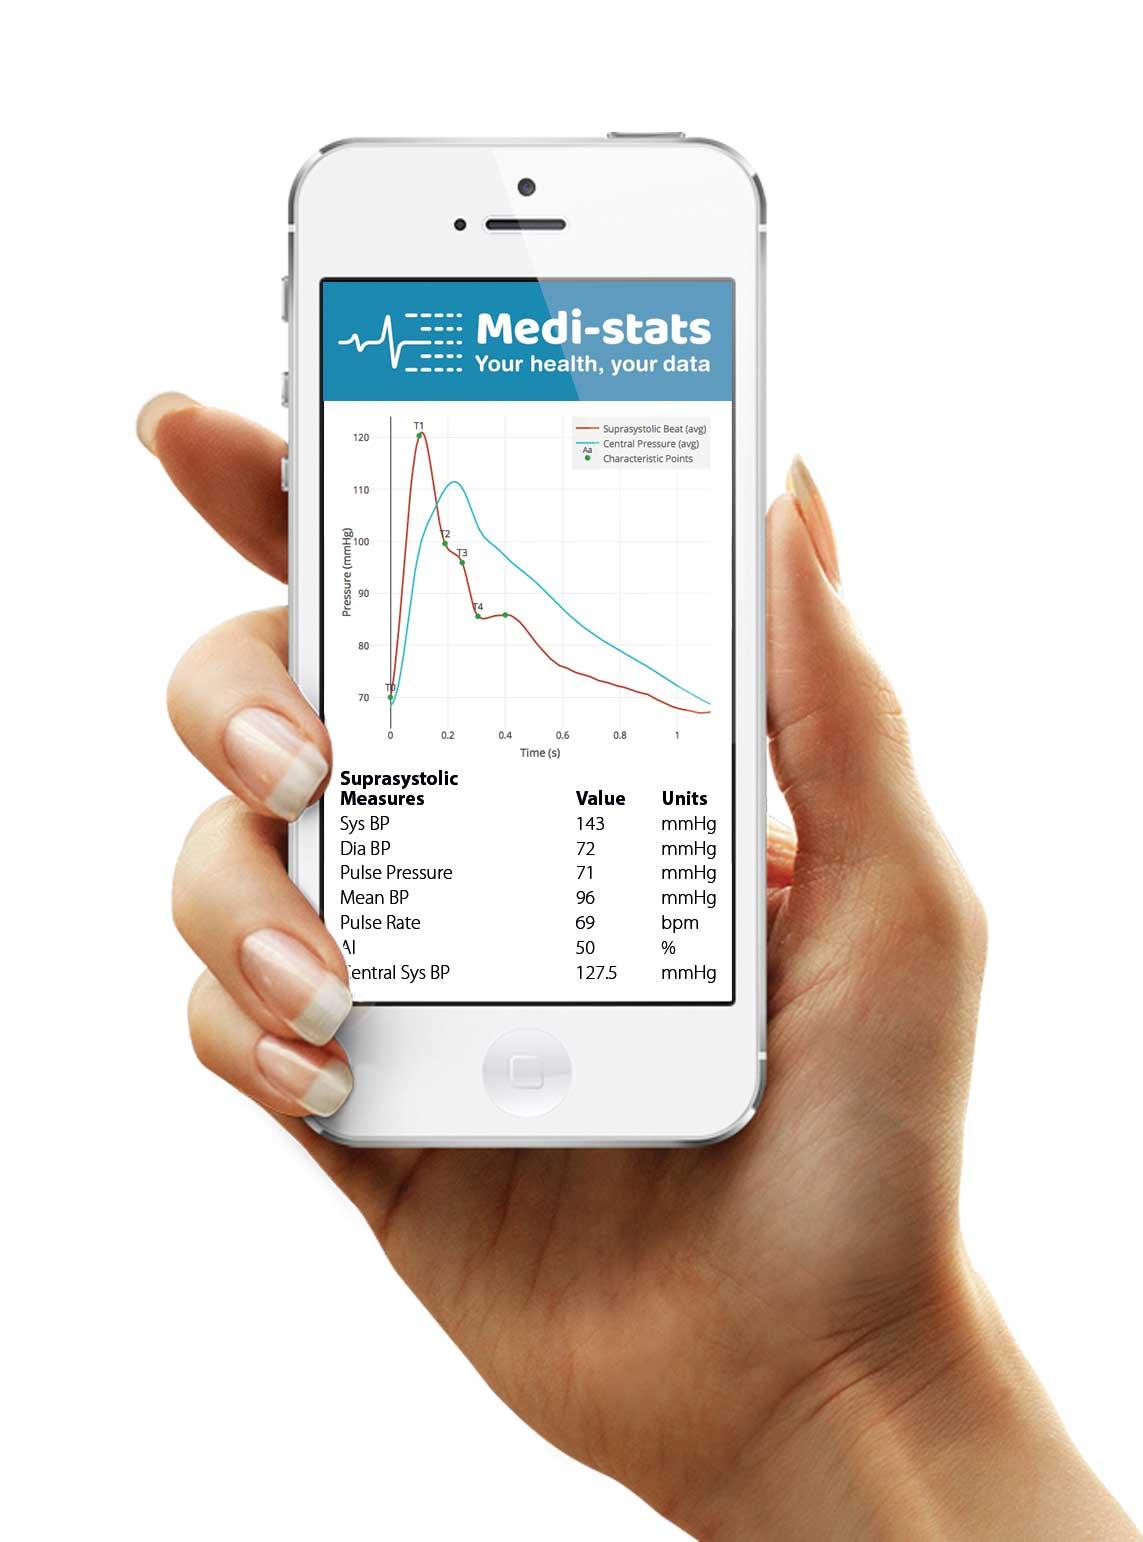 Medi-stats-iphone.jpg